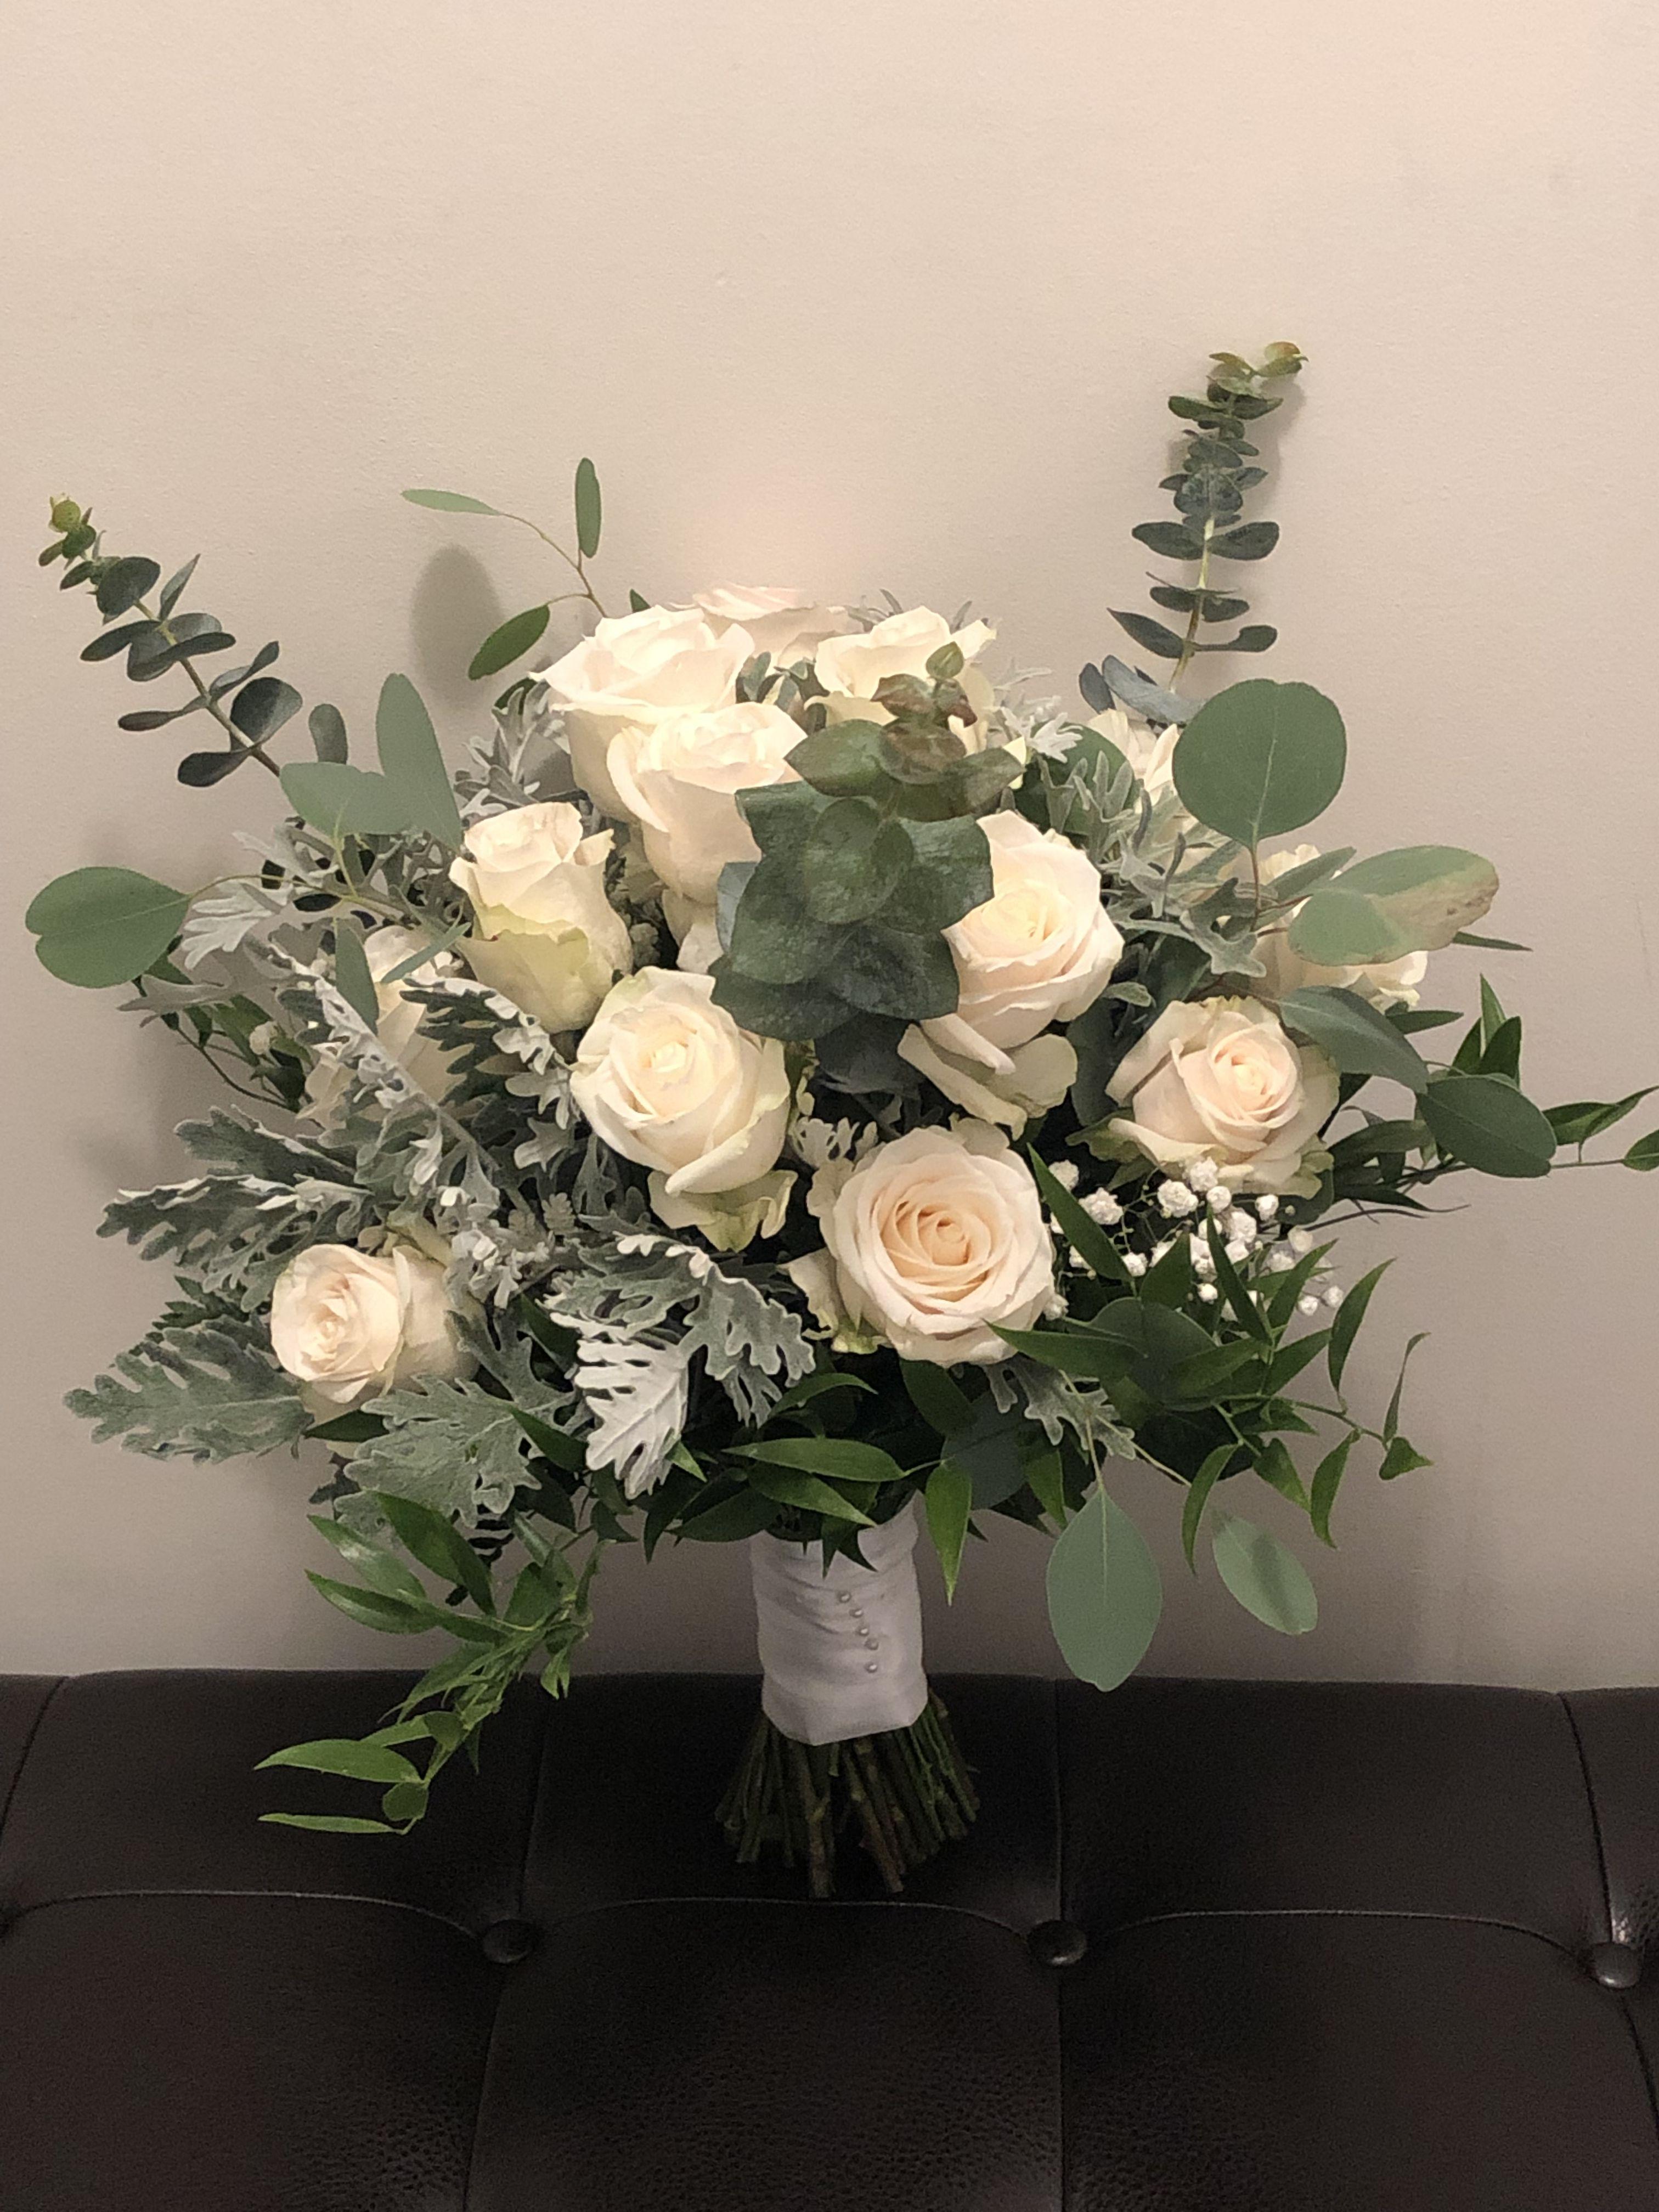 1 Bouquet 21 Tint Head Artifical Fake Rose Weeding Party Home Decor Silk Flower